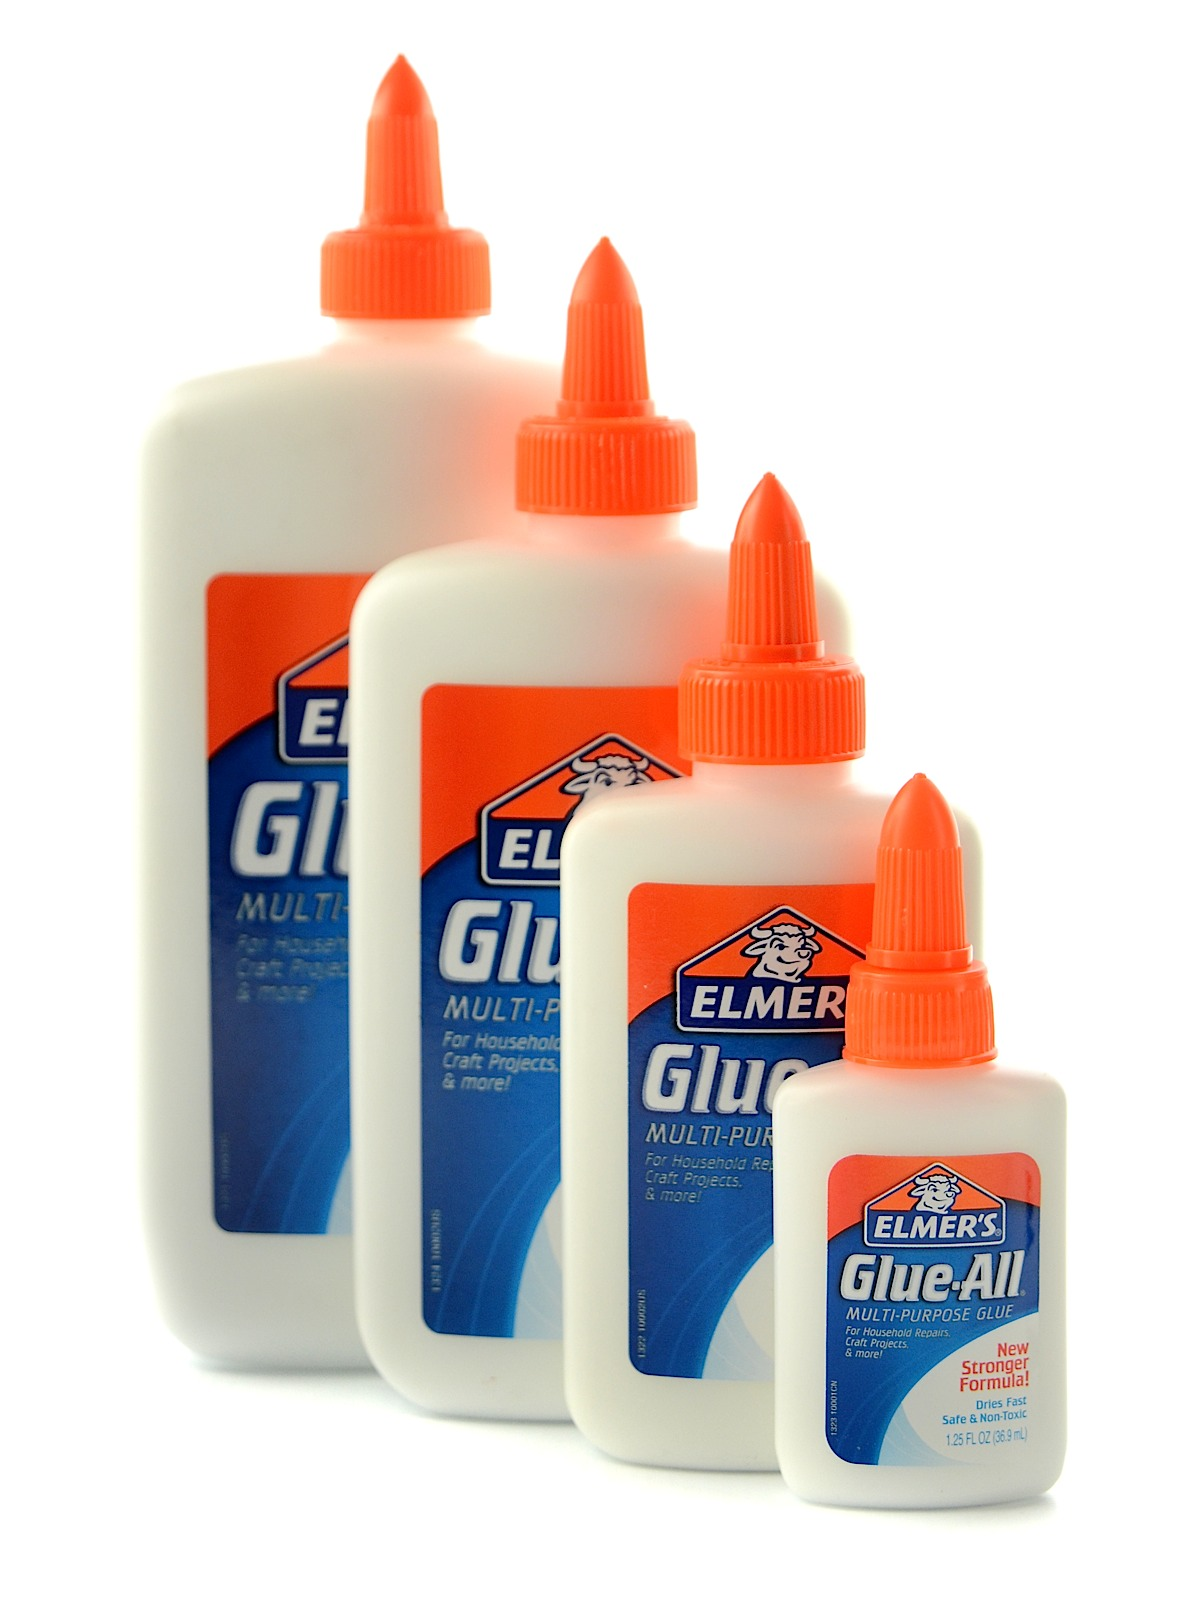 Glue-All